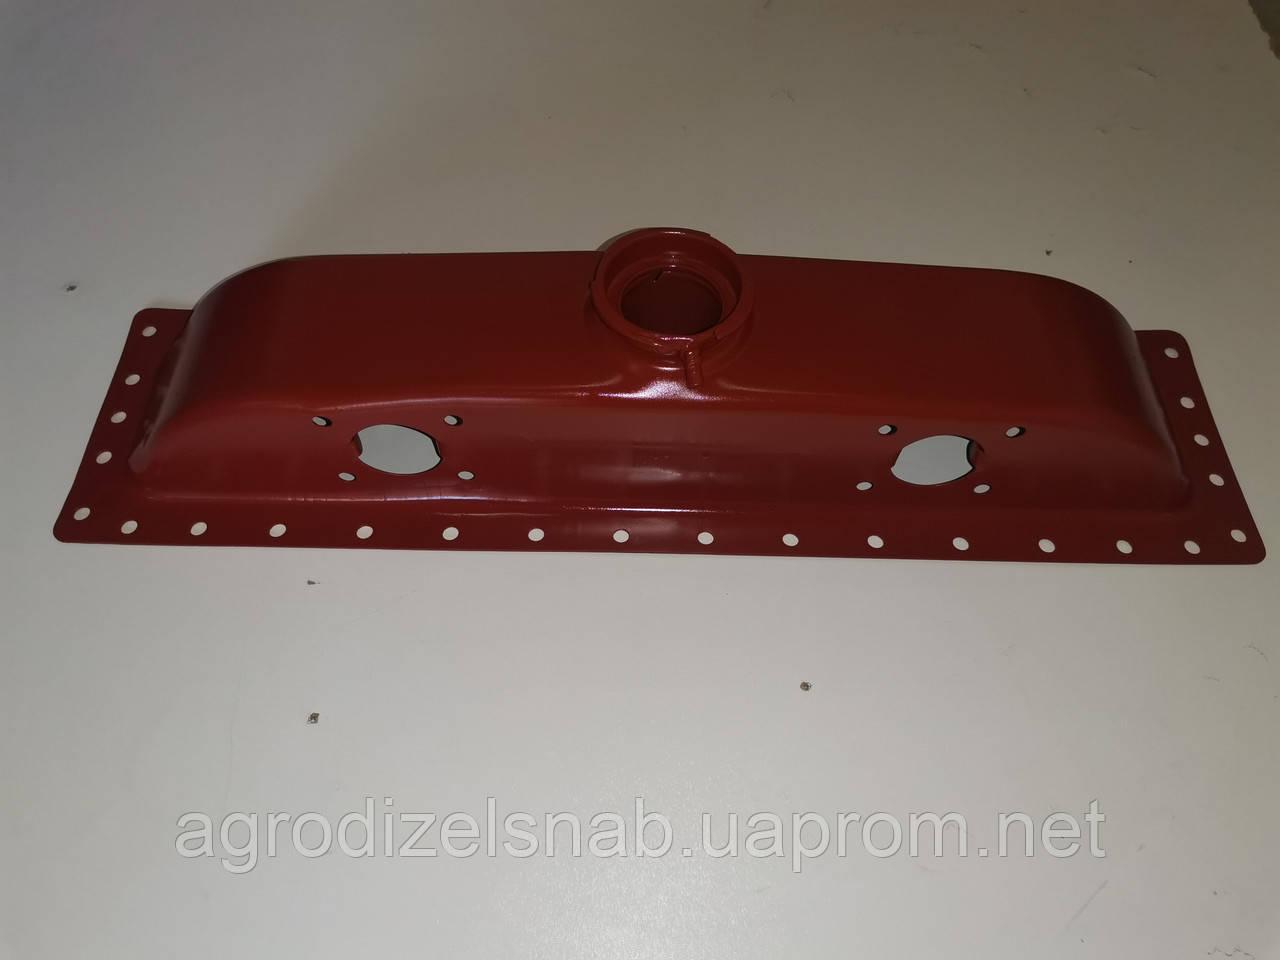 Бак радиатора верхний А-01М, А-41 (77У.13.050-01)